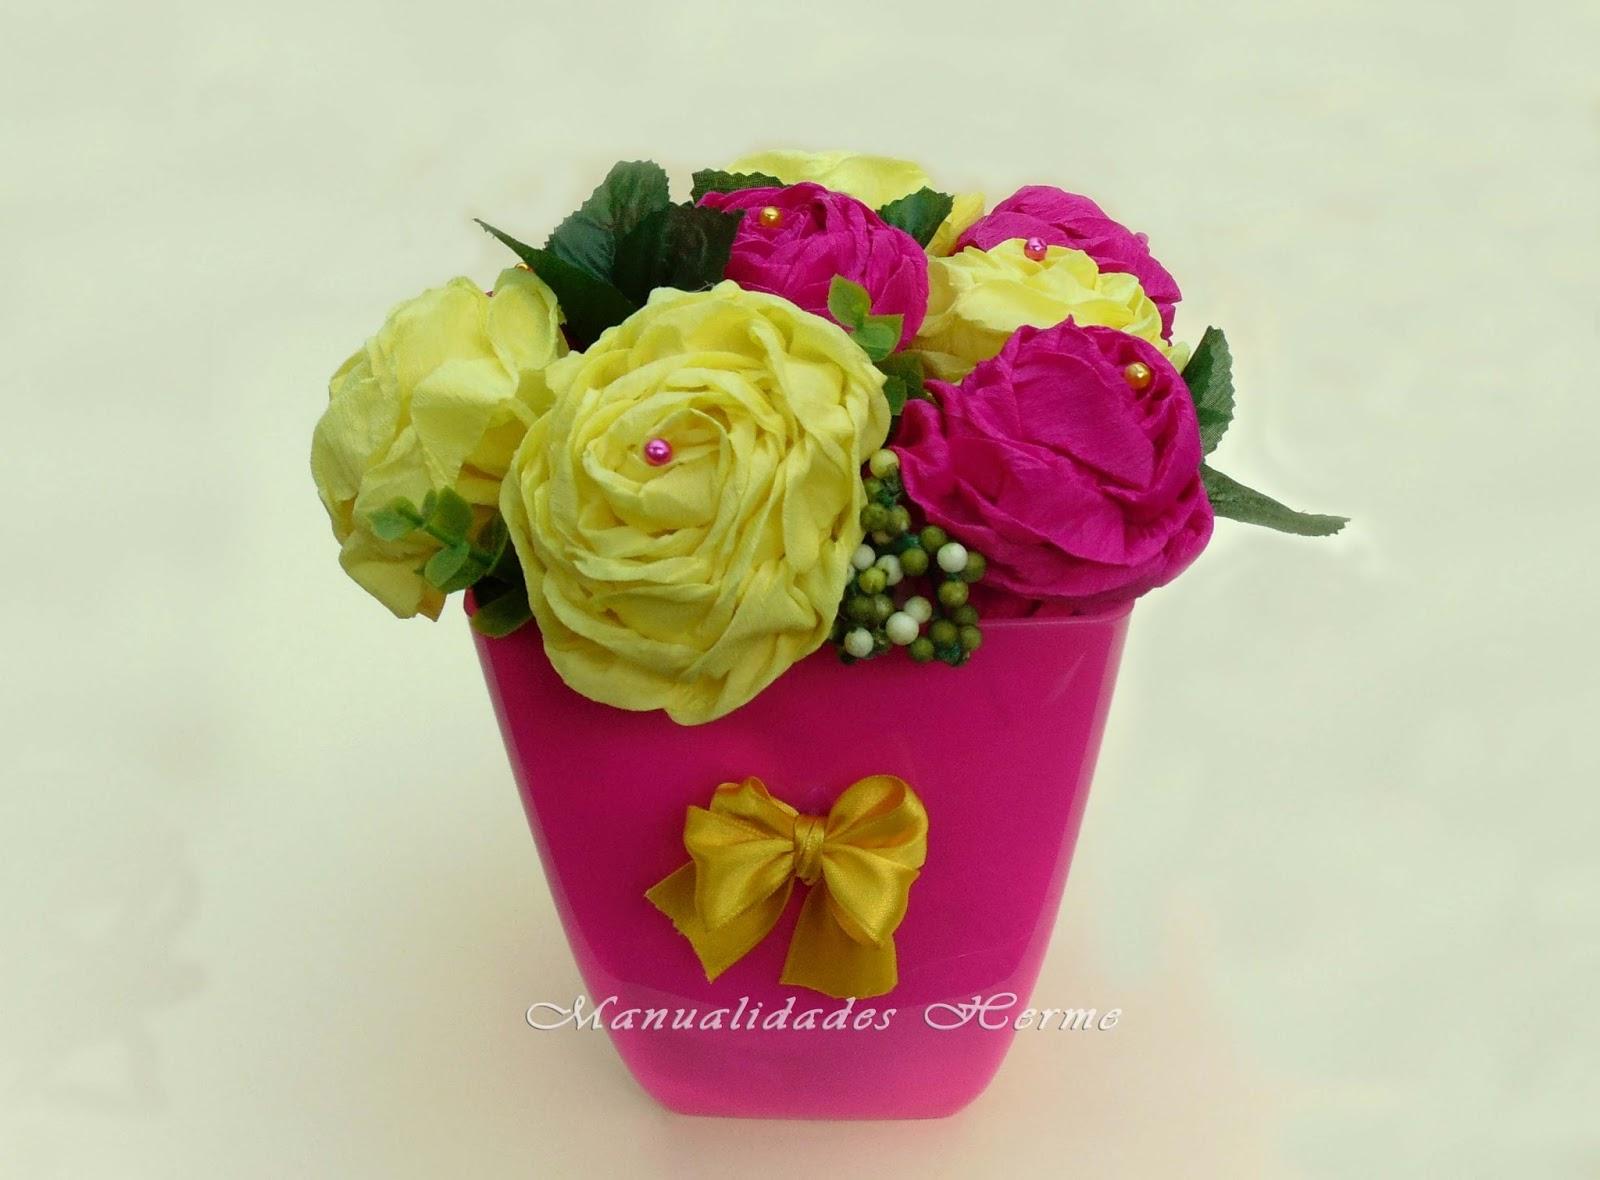 Como Hacer Rosas De Papel - Cmo-hacer-rosas-de-papel